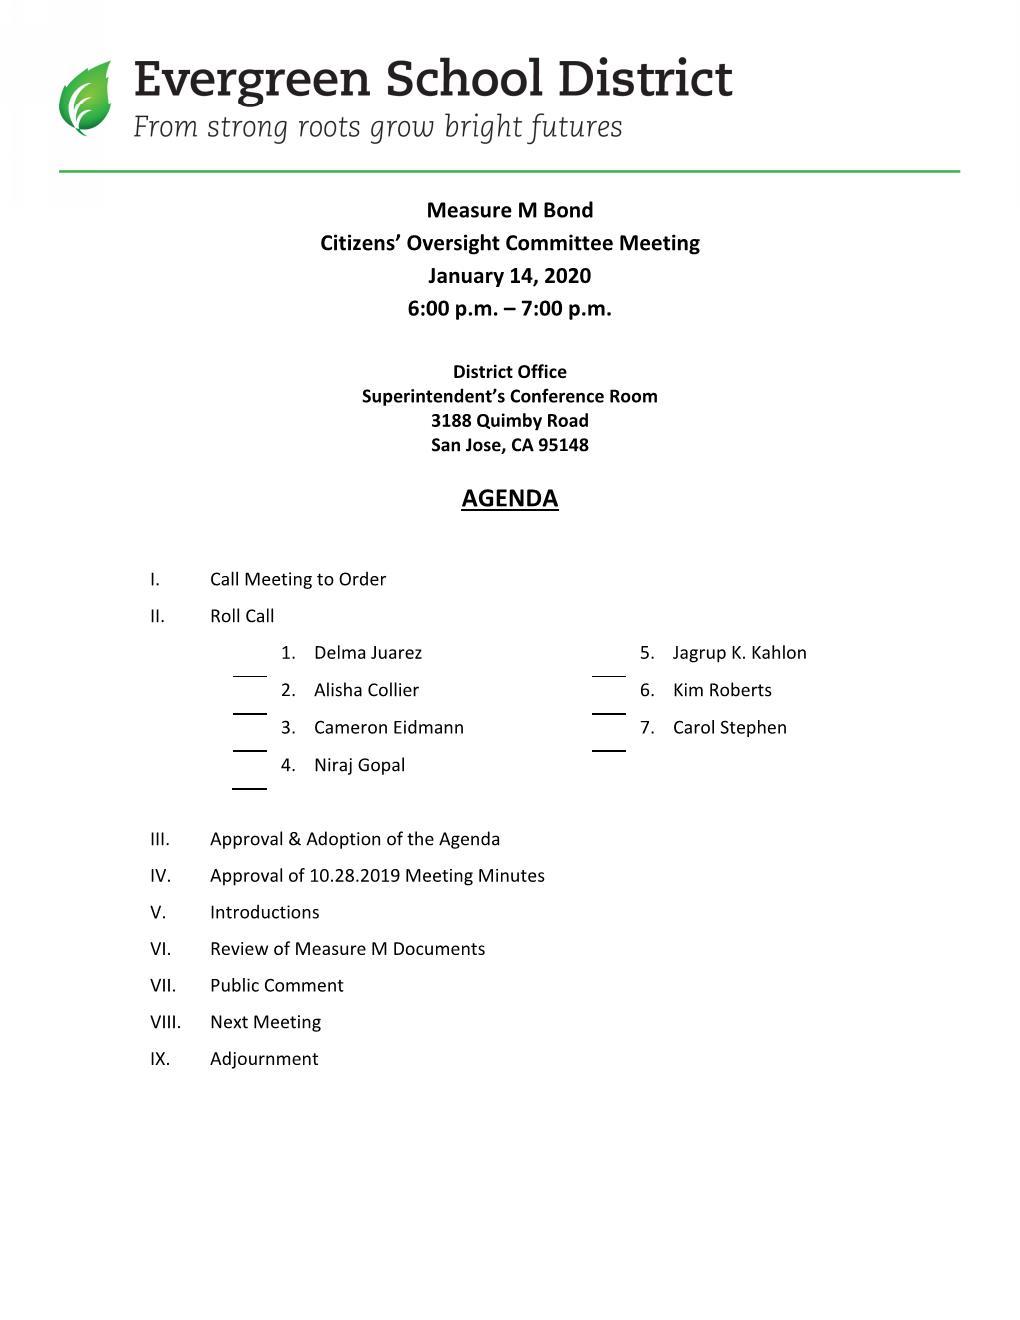 Agenda/Meeting Minutes 1/14/2020